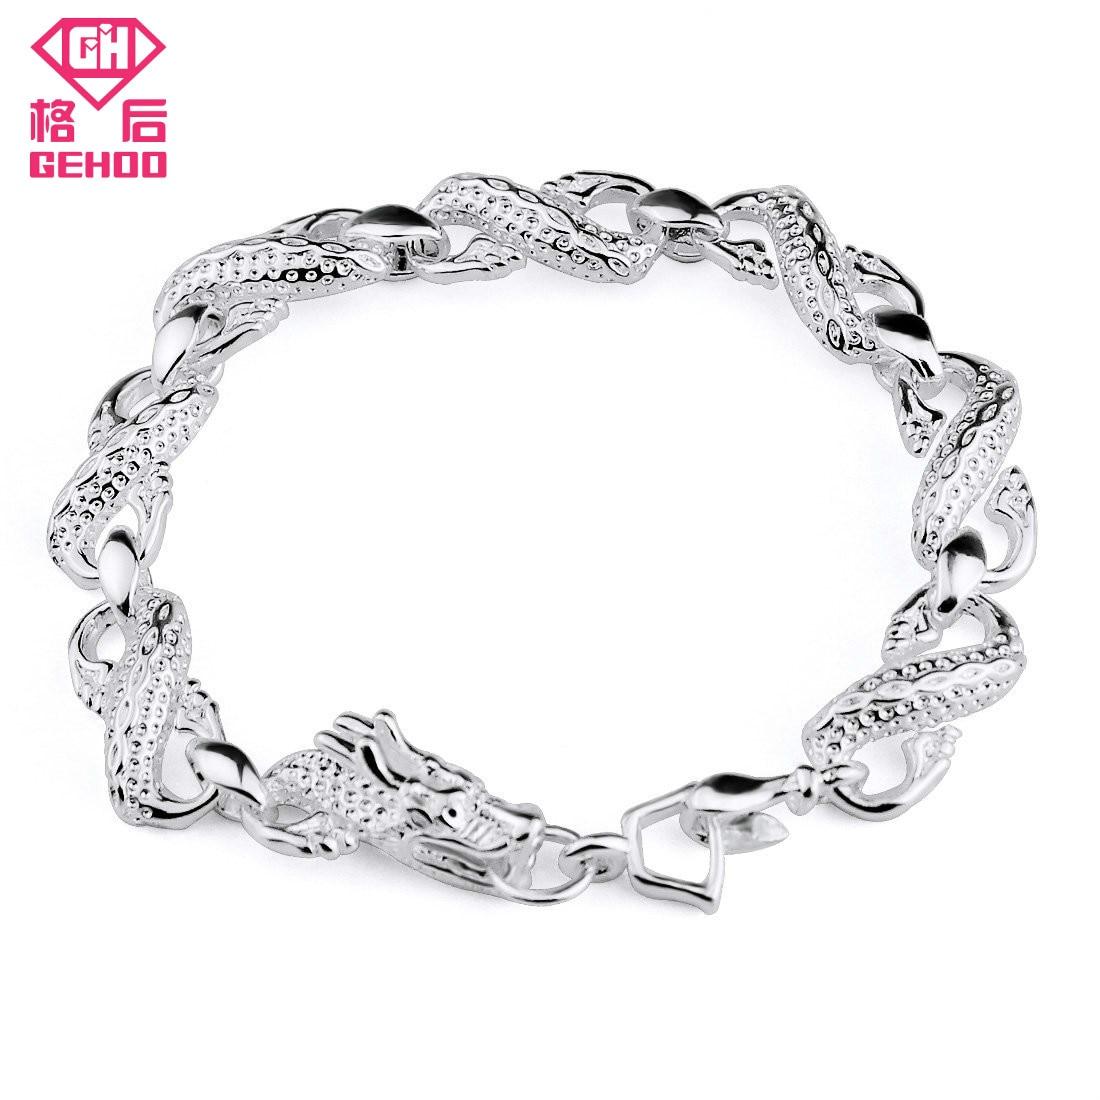 Gehoo Fashion Jewelry Silver Plated Bracelet Chinese White Dragon Bracelet Pattern Men S Jewelry